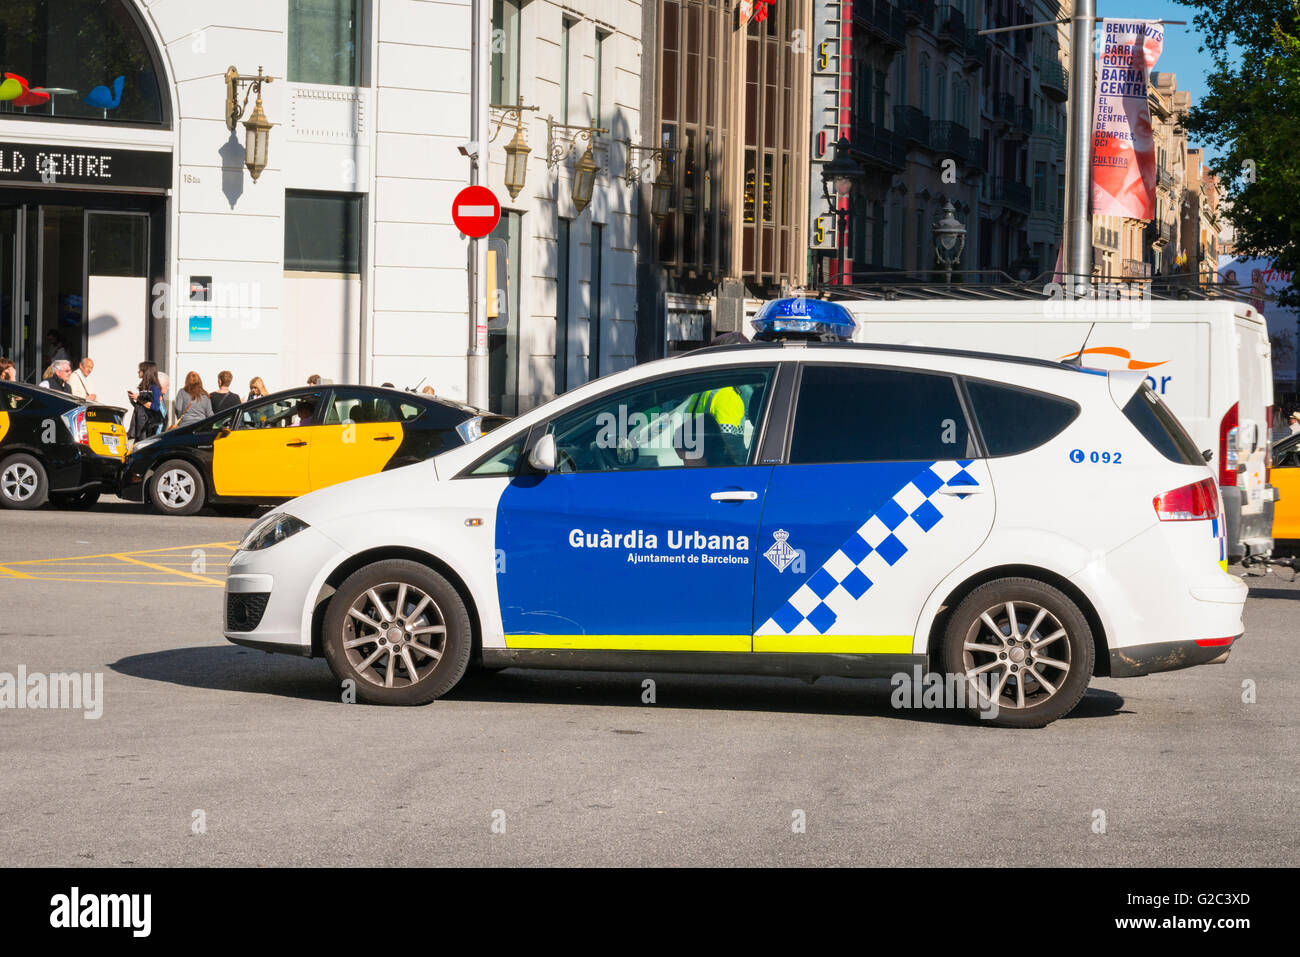 Spain Catalonia Eixample Passeig de Gracia police car Guardia Urbana Ajuntament de Barcelona blue & white - Stock Image